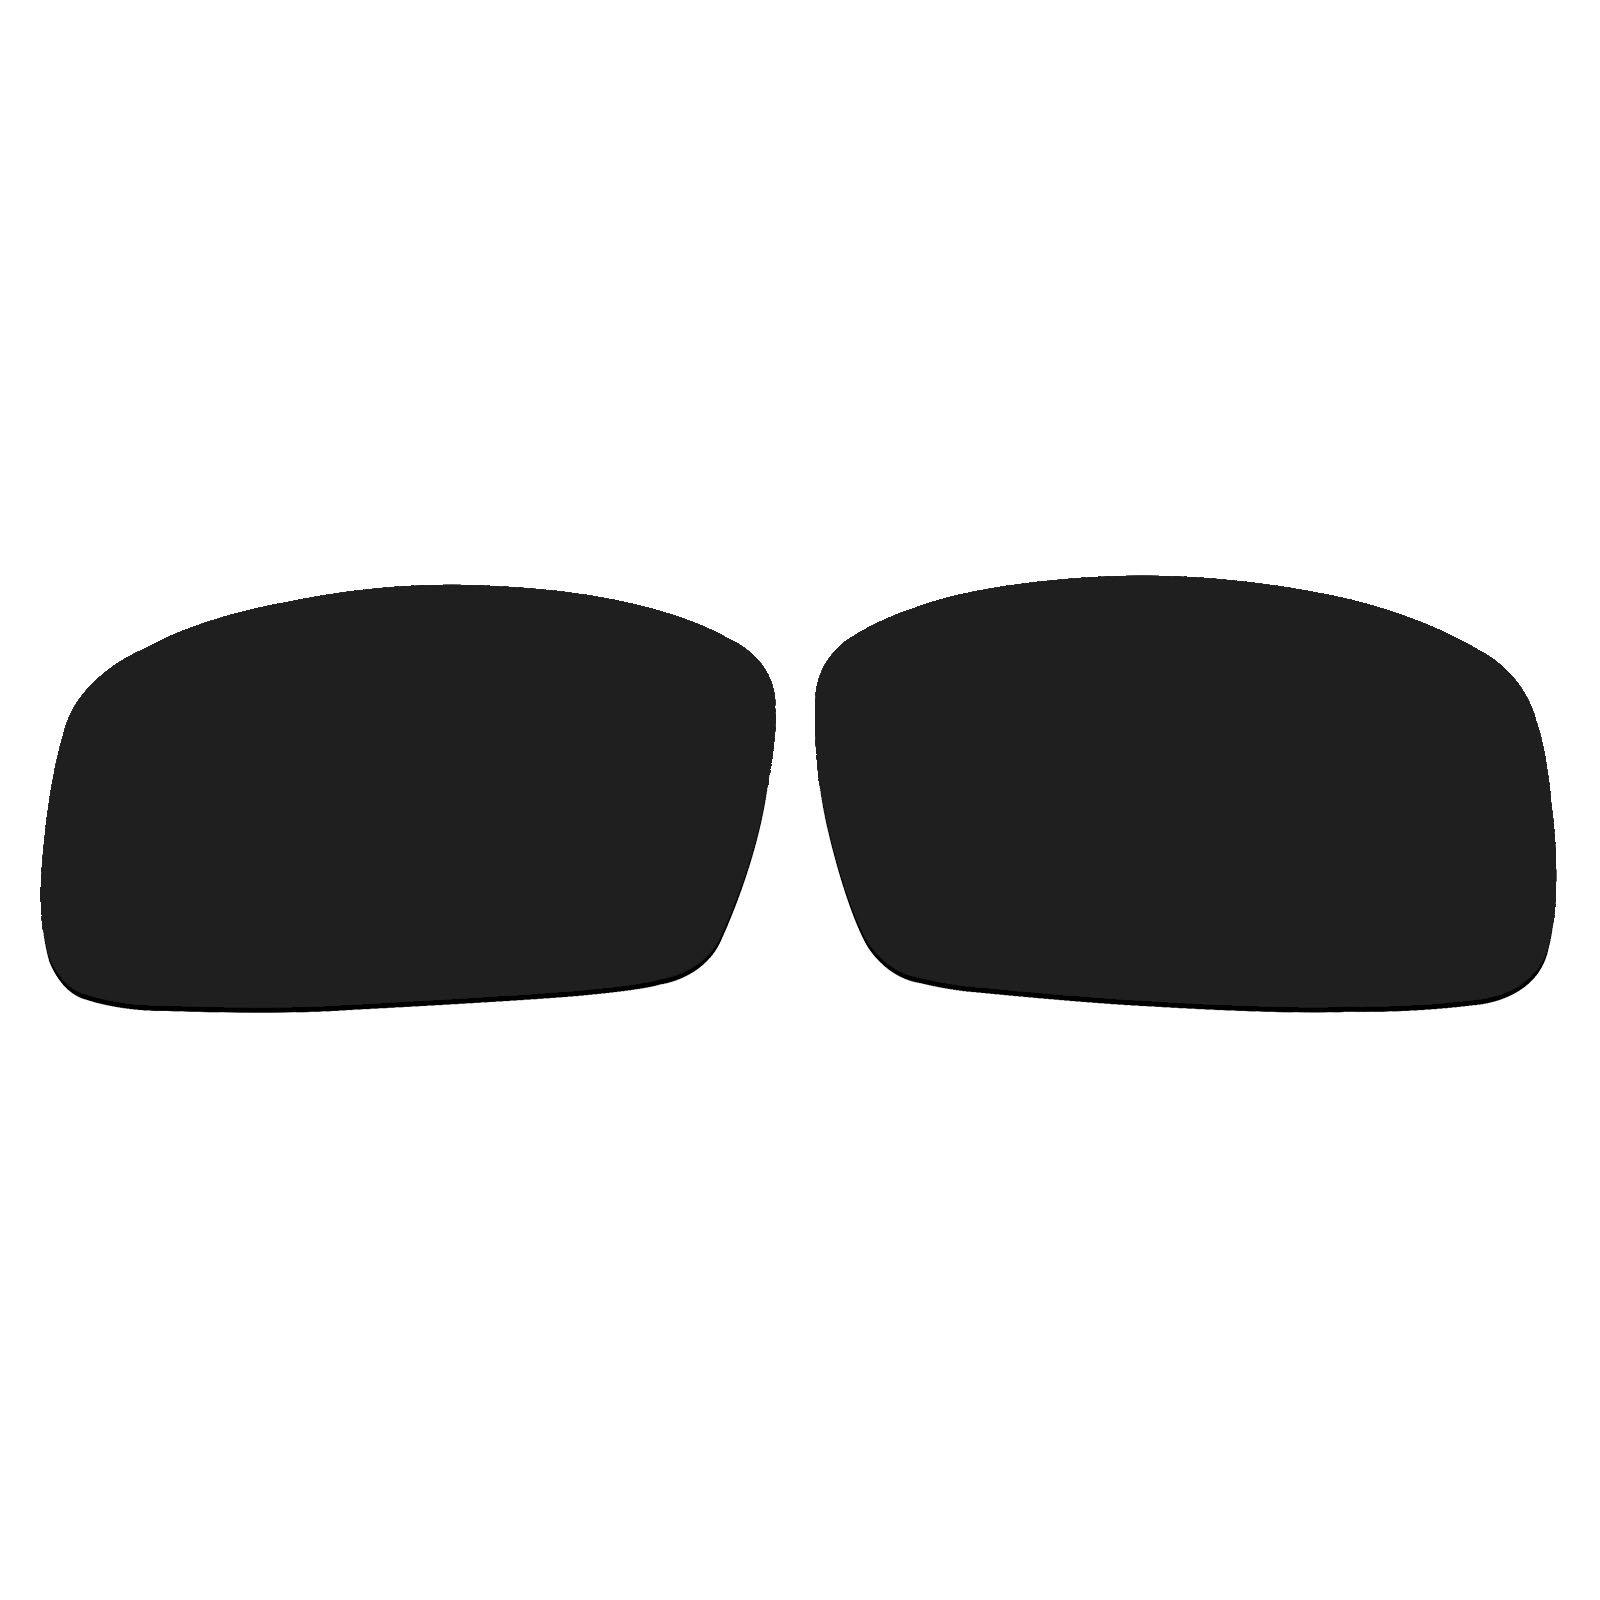 Polarized Replacement Sunglasses UV Lenses for Spy Optic General - Black